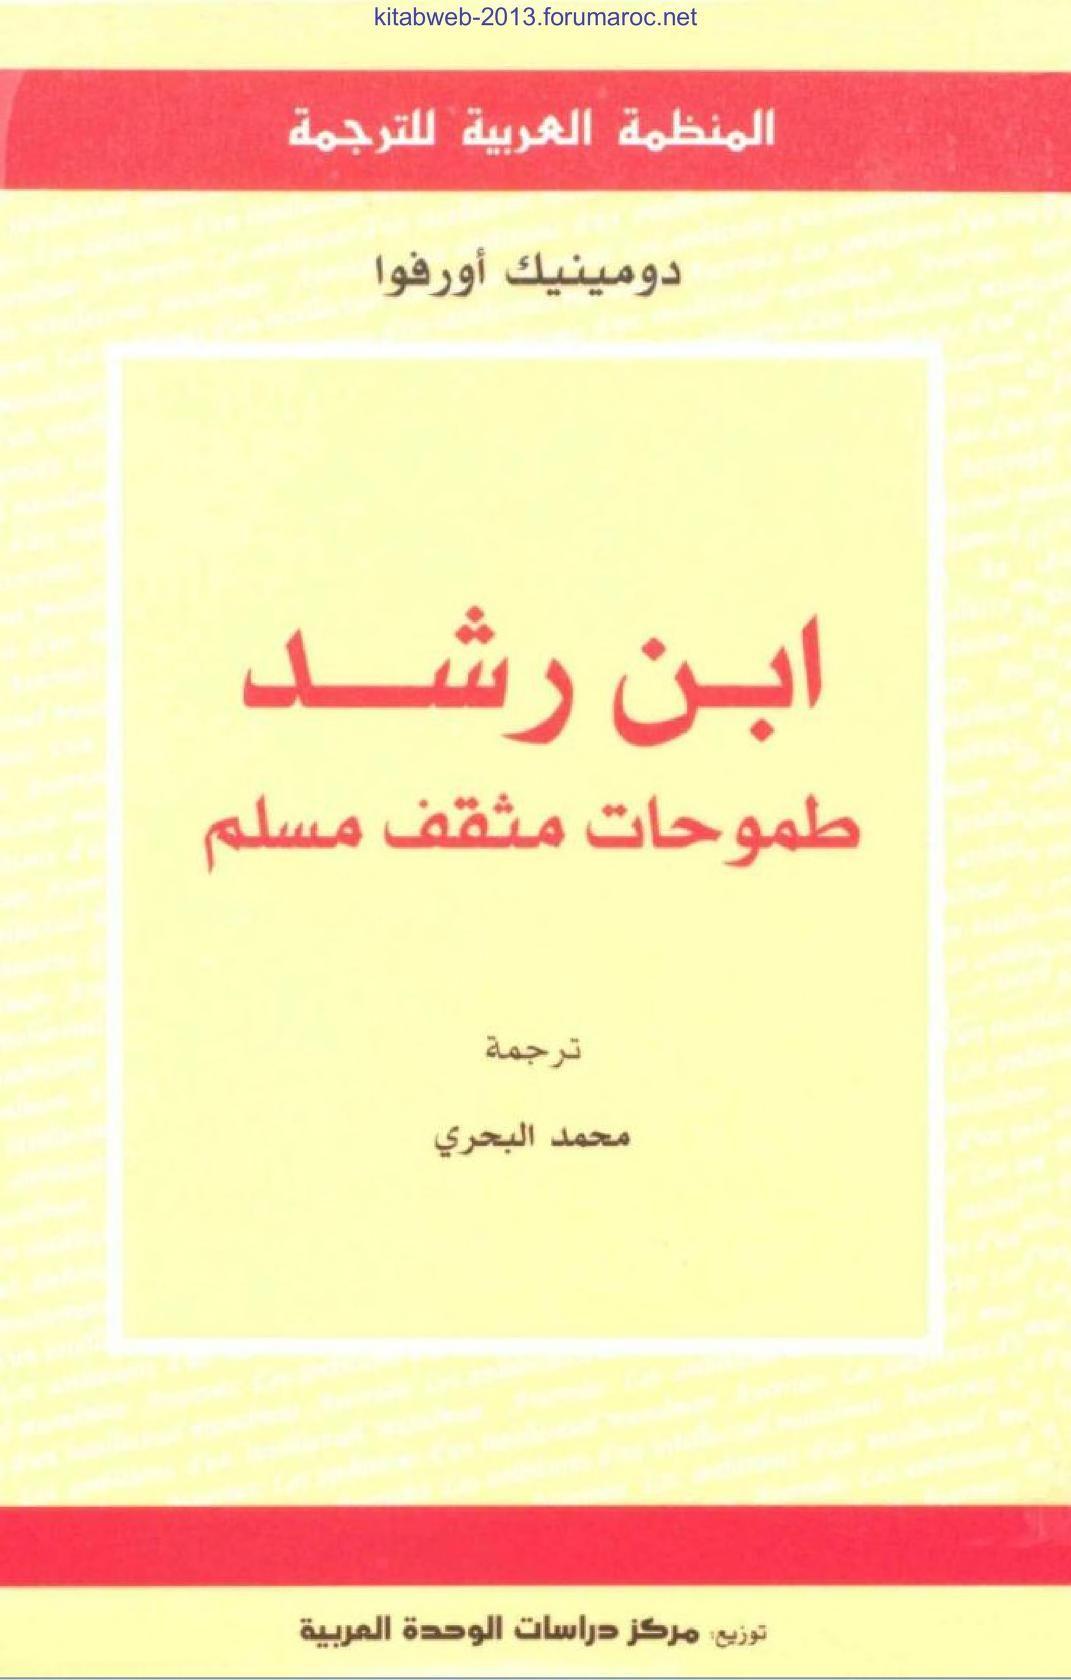 ابن رشد طموحات مثقف مسلم دومينيك أورفوا Kitabweb 2013 Forumaroc Net Free Download Borrow And Streaming Internet Archive Arabic Books Book Worms My Books